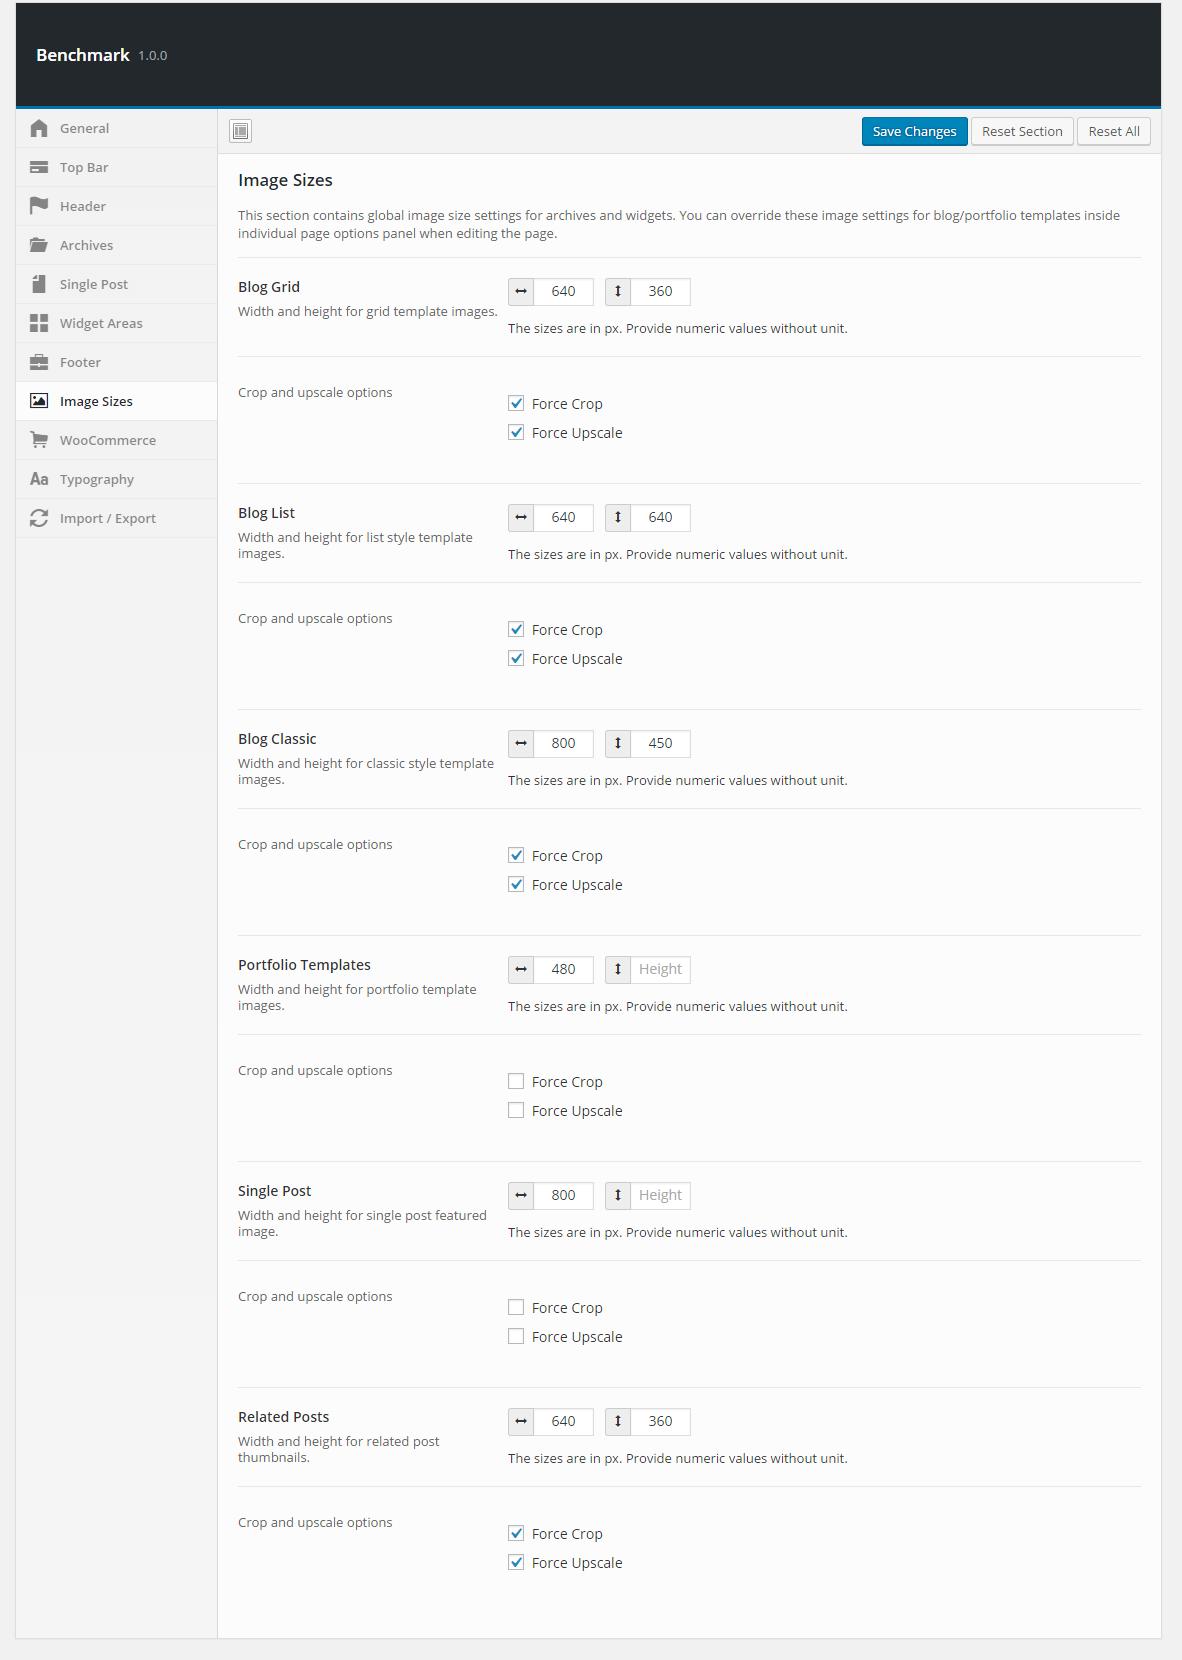 Gmail theme image size - Benchmark Responsive Multipurpose One Page Landing Page Wordpress Theme